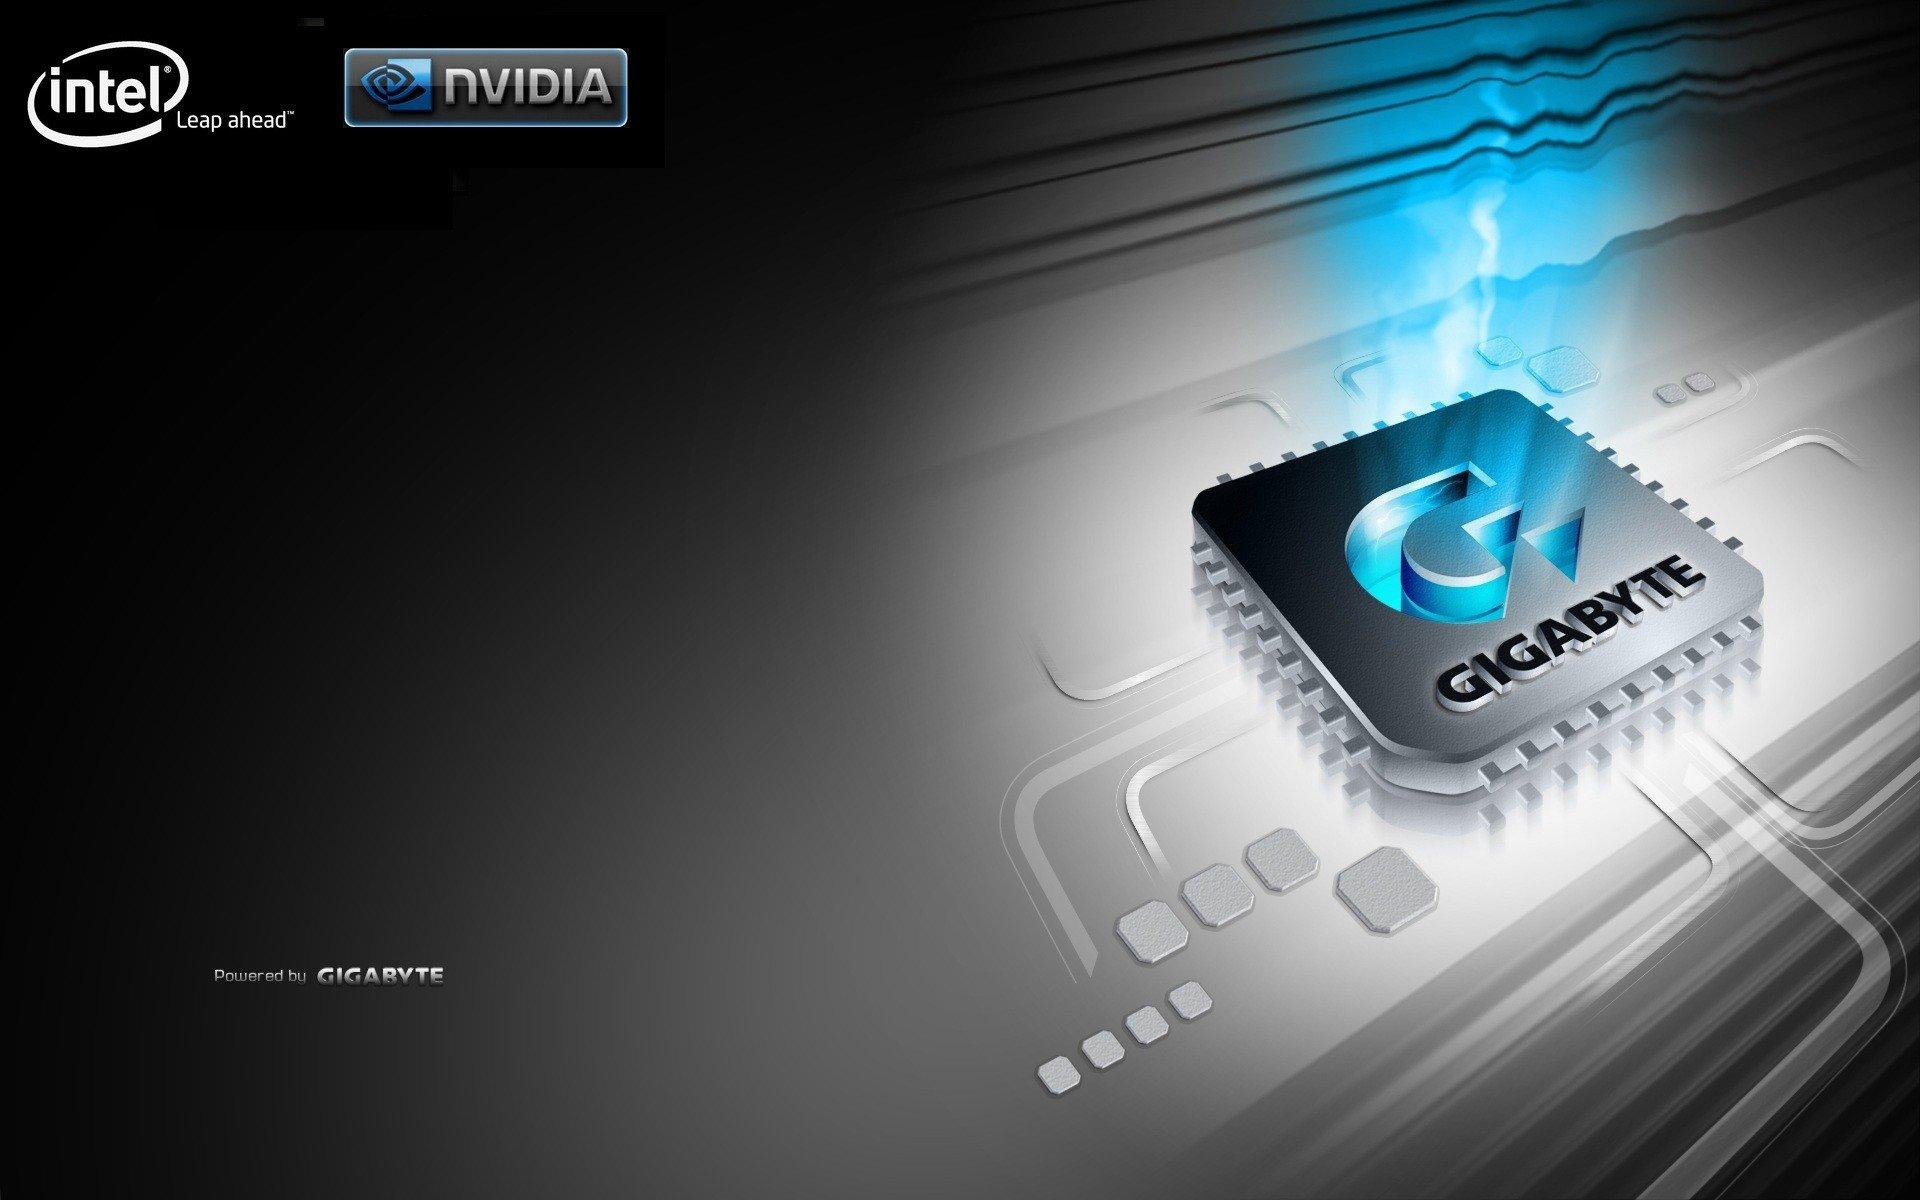 nvidia intel gigabyte wallpaper -#main